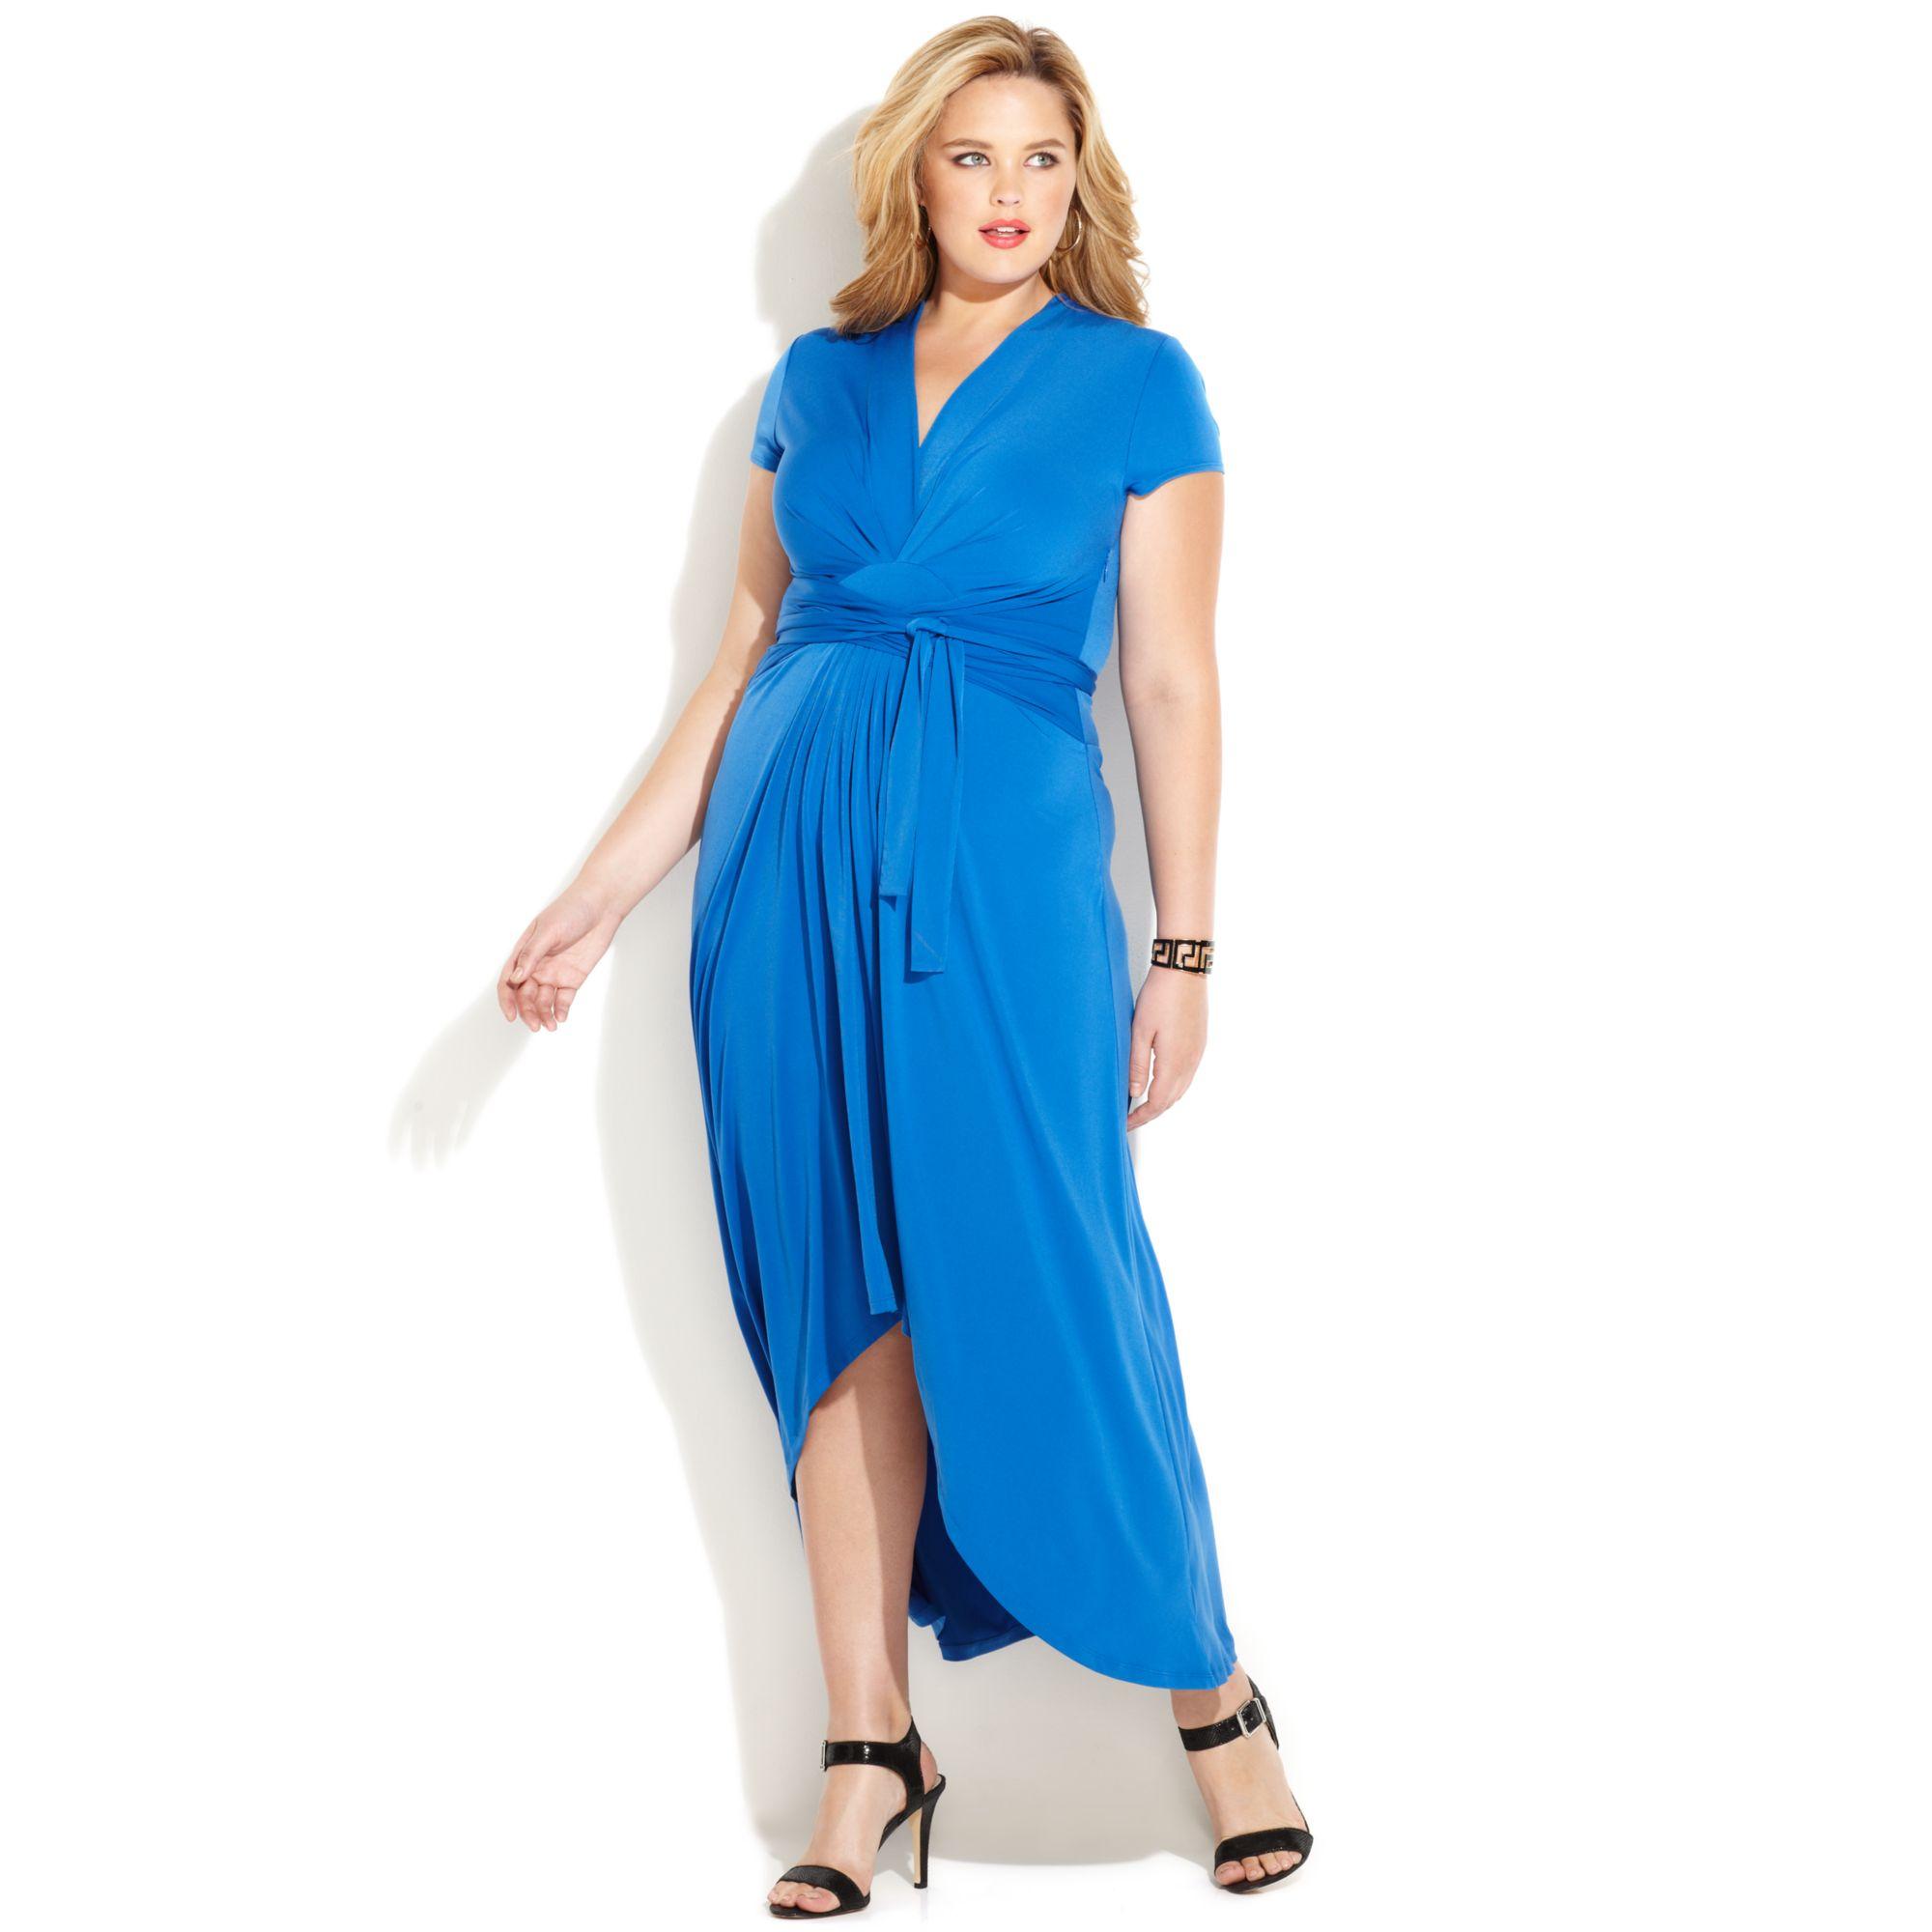 Lyst Michael kors Michael Plus Size Fauxwrap Maxi Dress